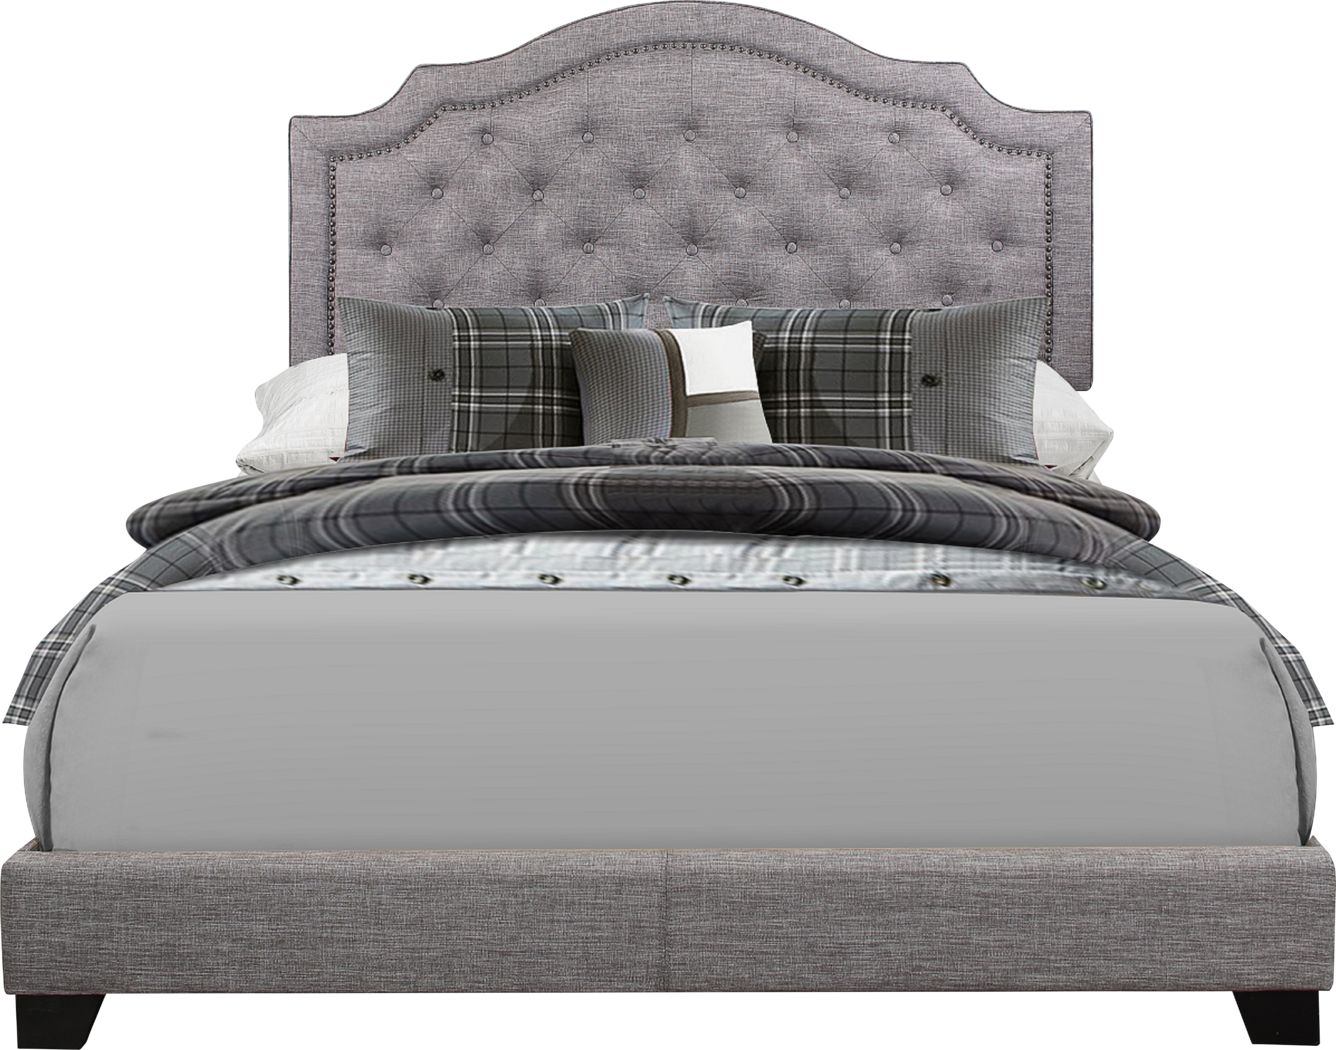 Bowerton Gray King Upholstered Bed